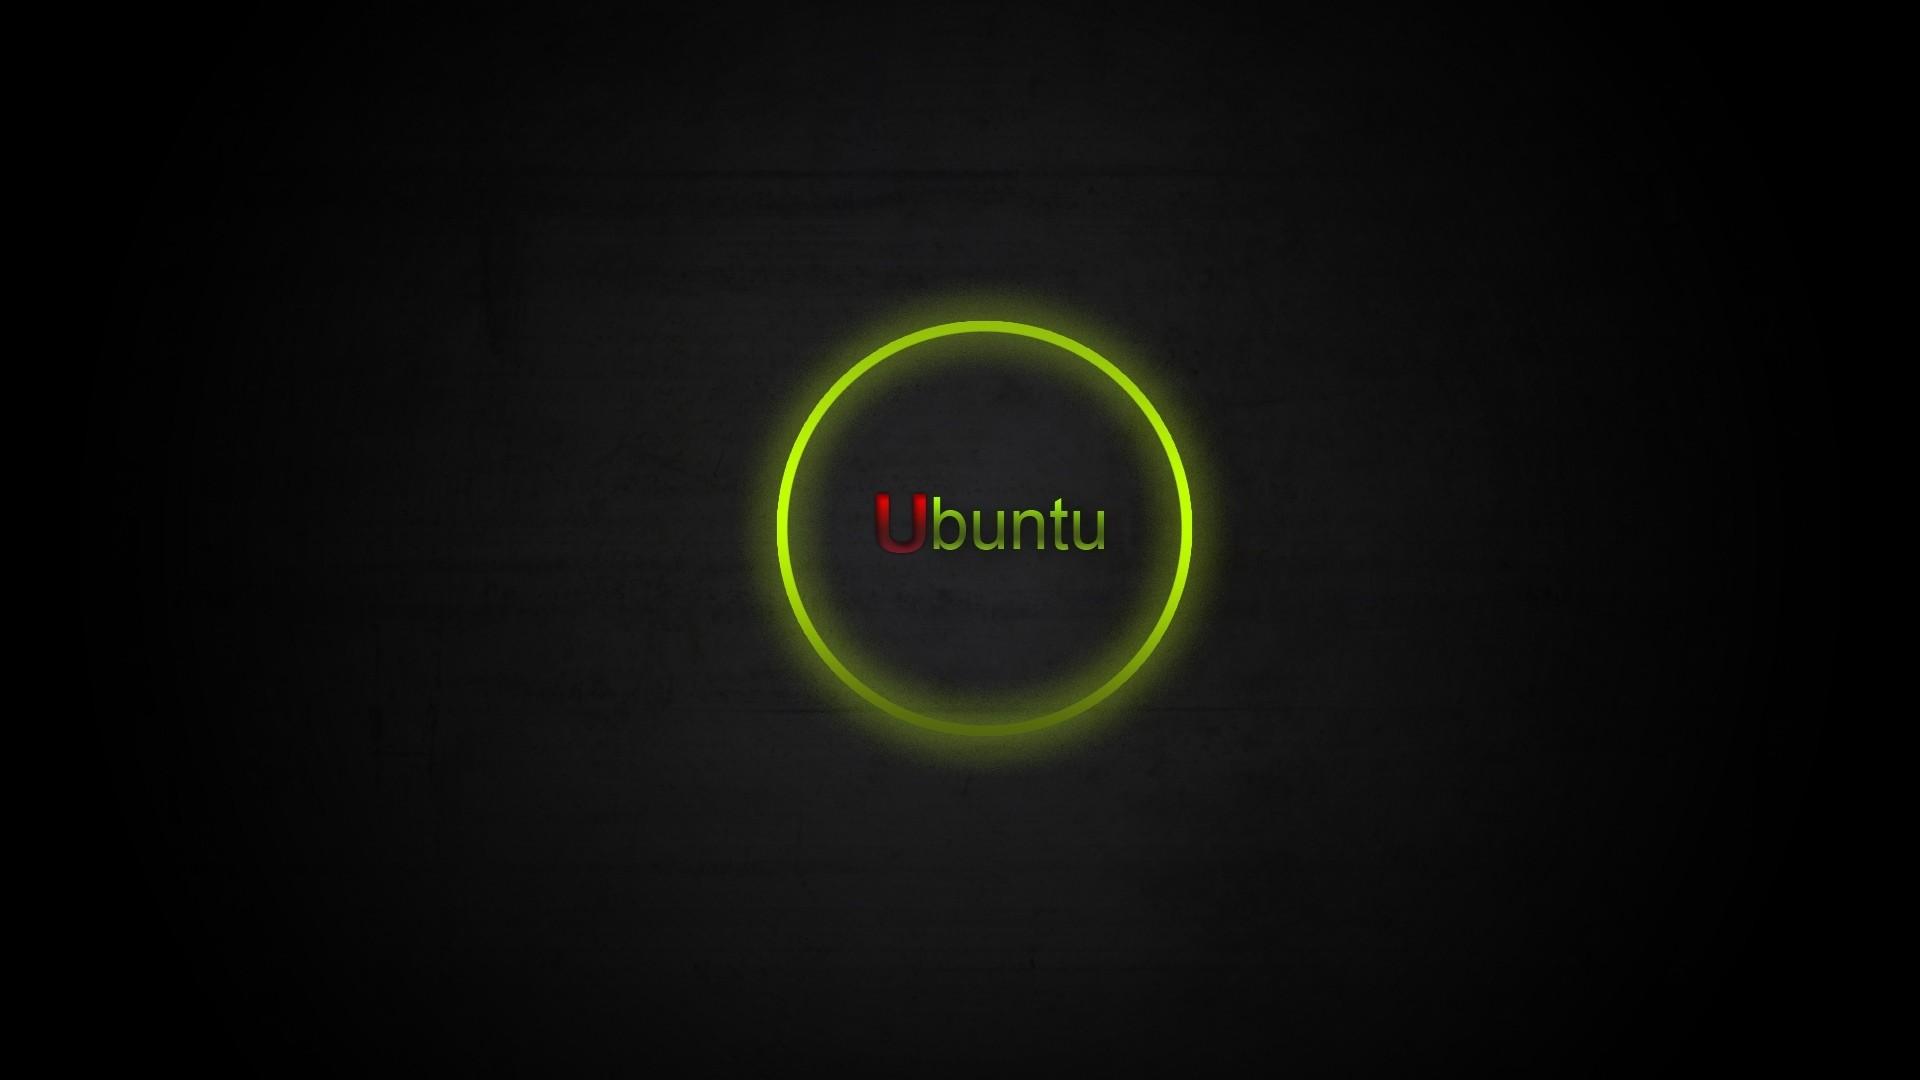 Wallpaper ubuntu, green, black, red